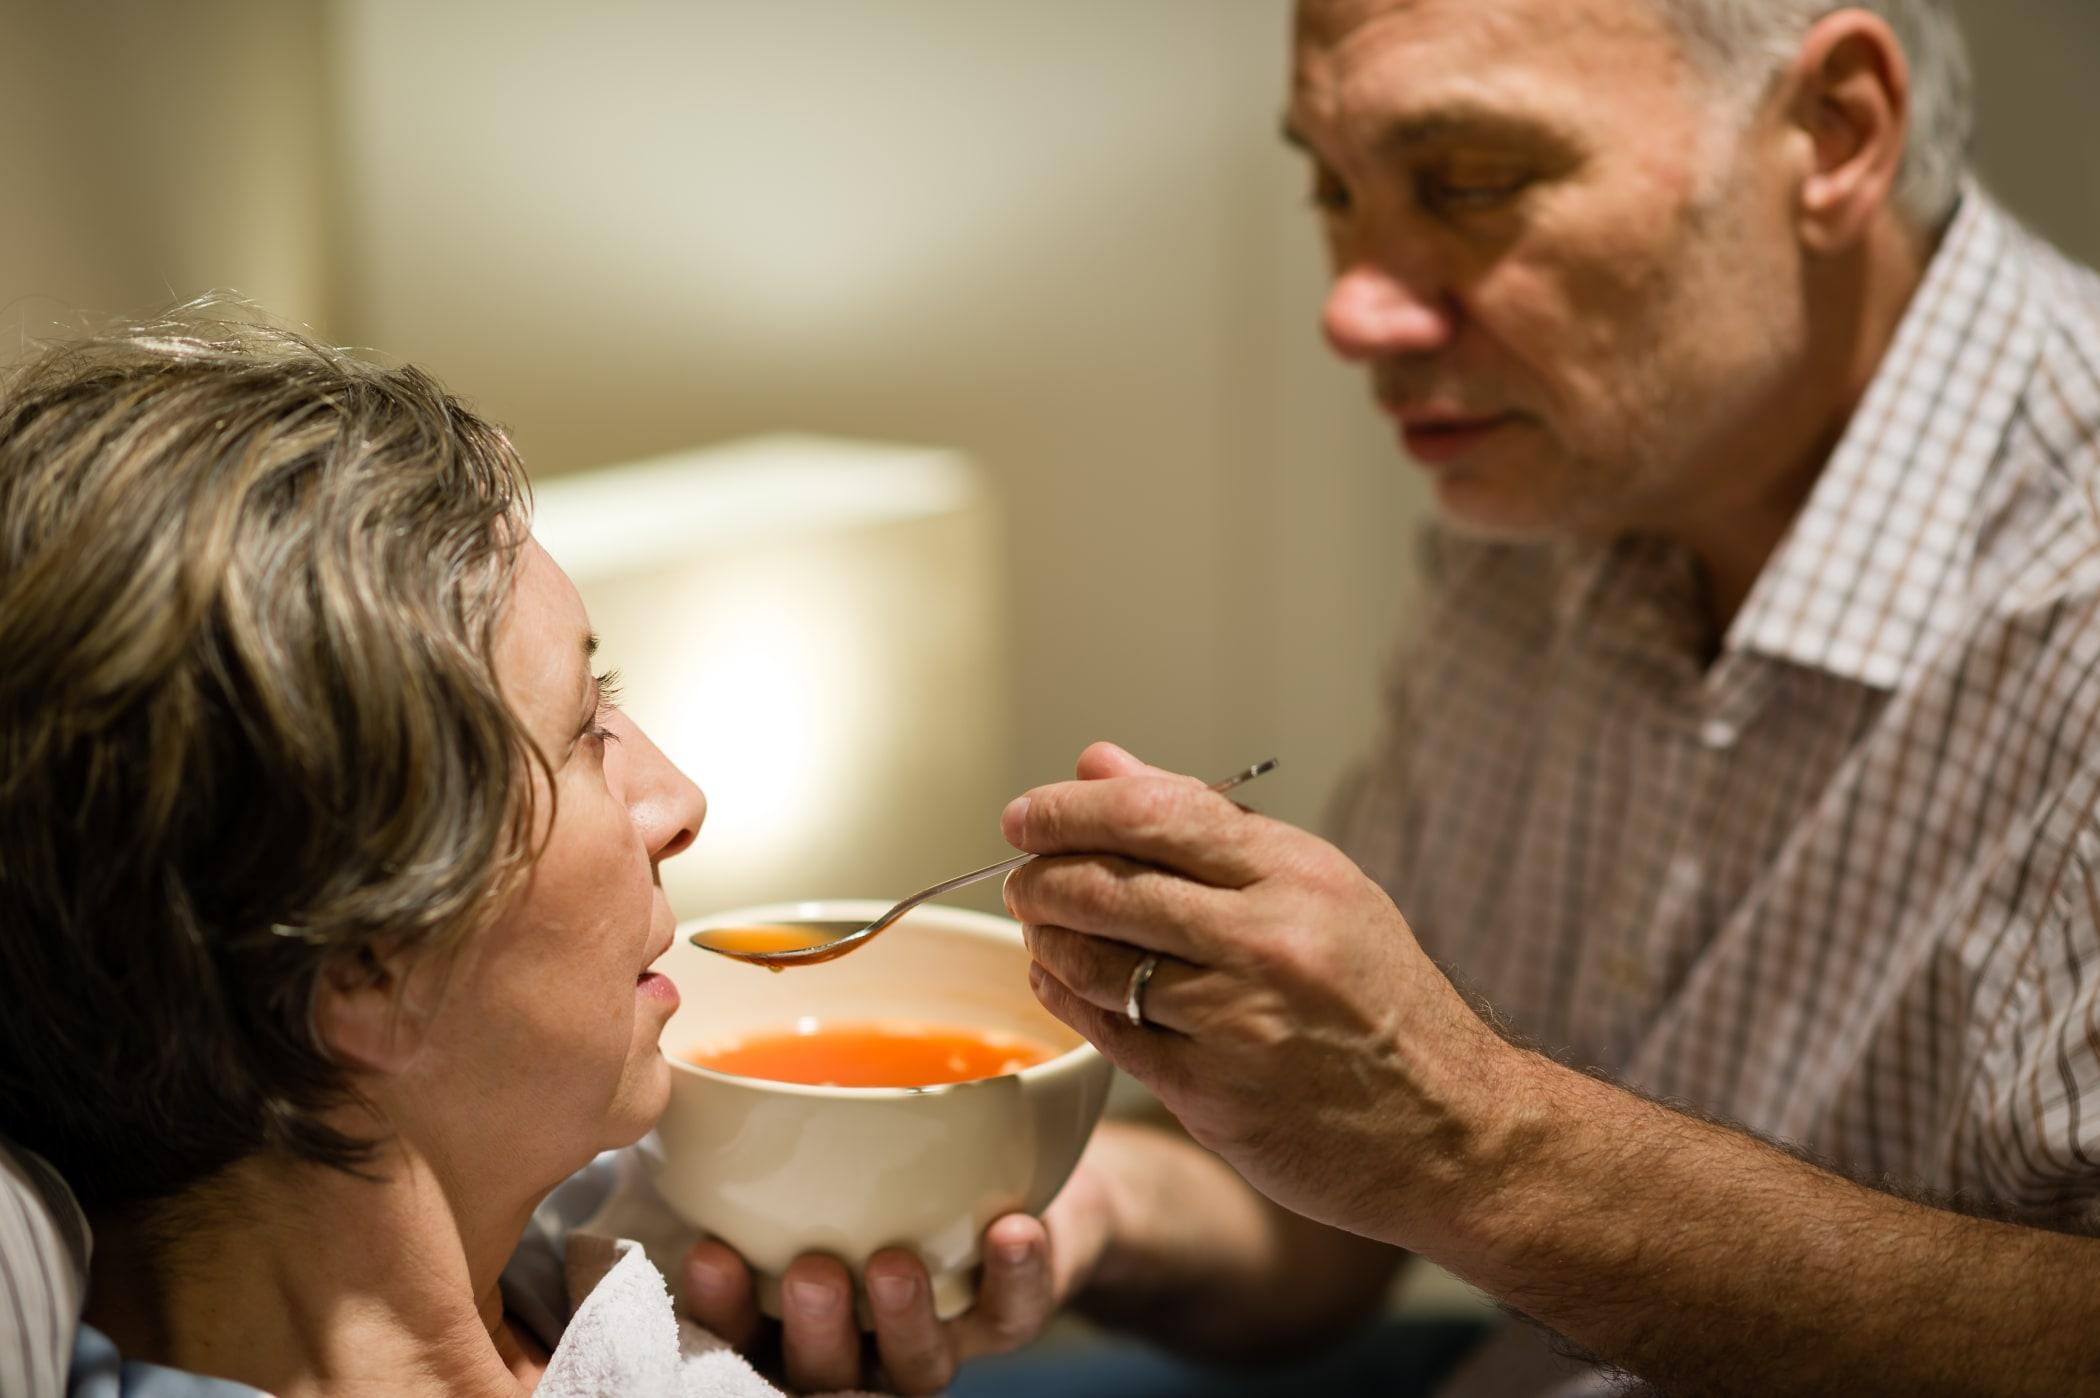 Man feeding his wife warm soup